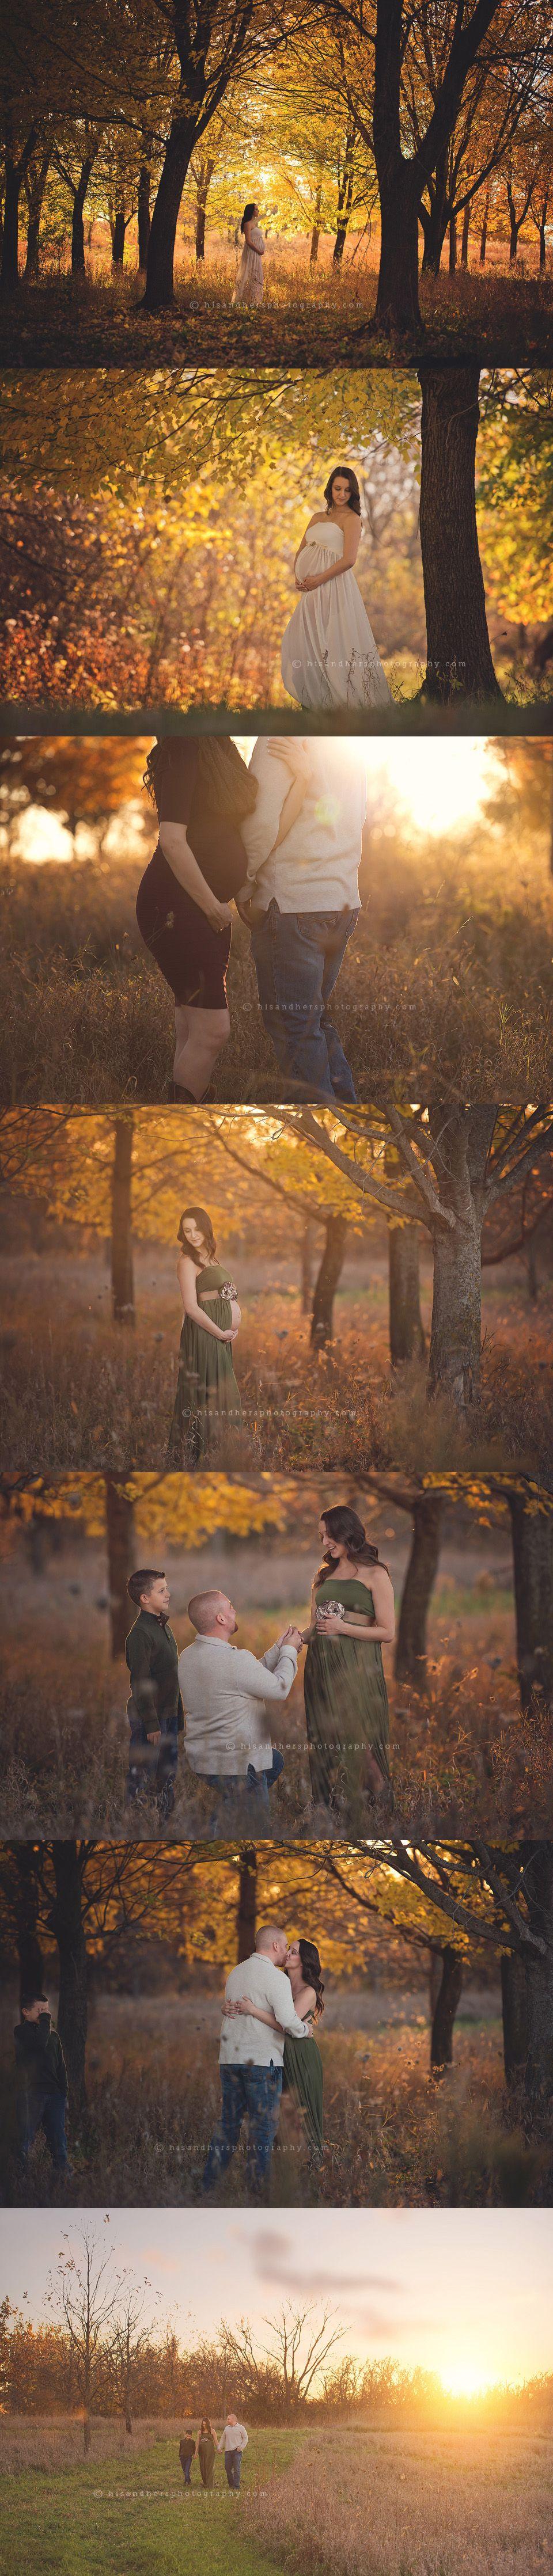 Maternity | Lindsay, 32 weeks